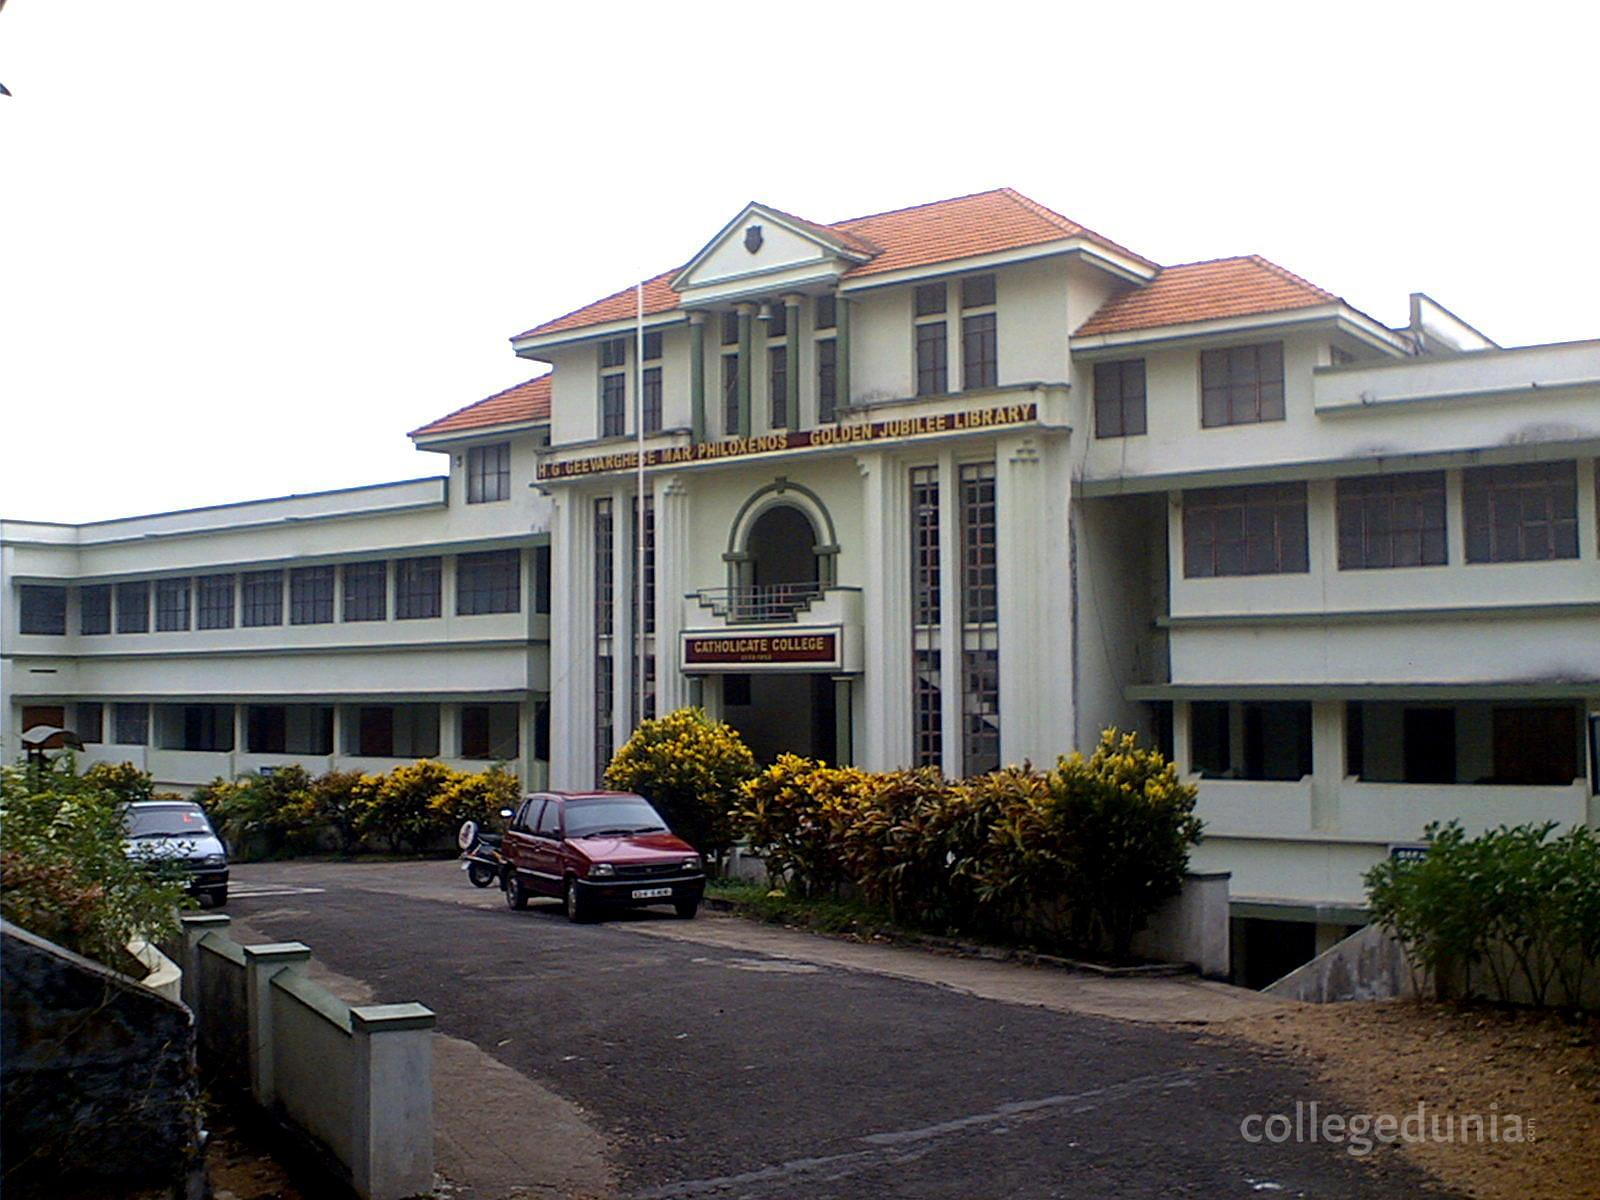 Catholicate College